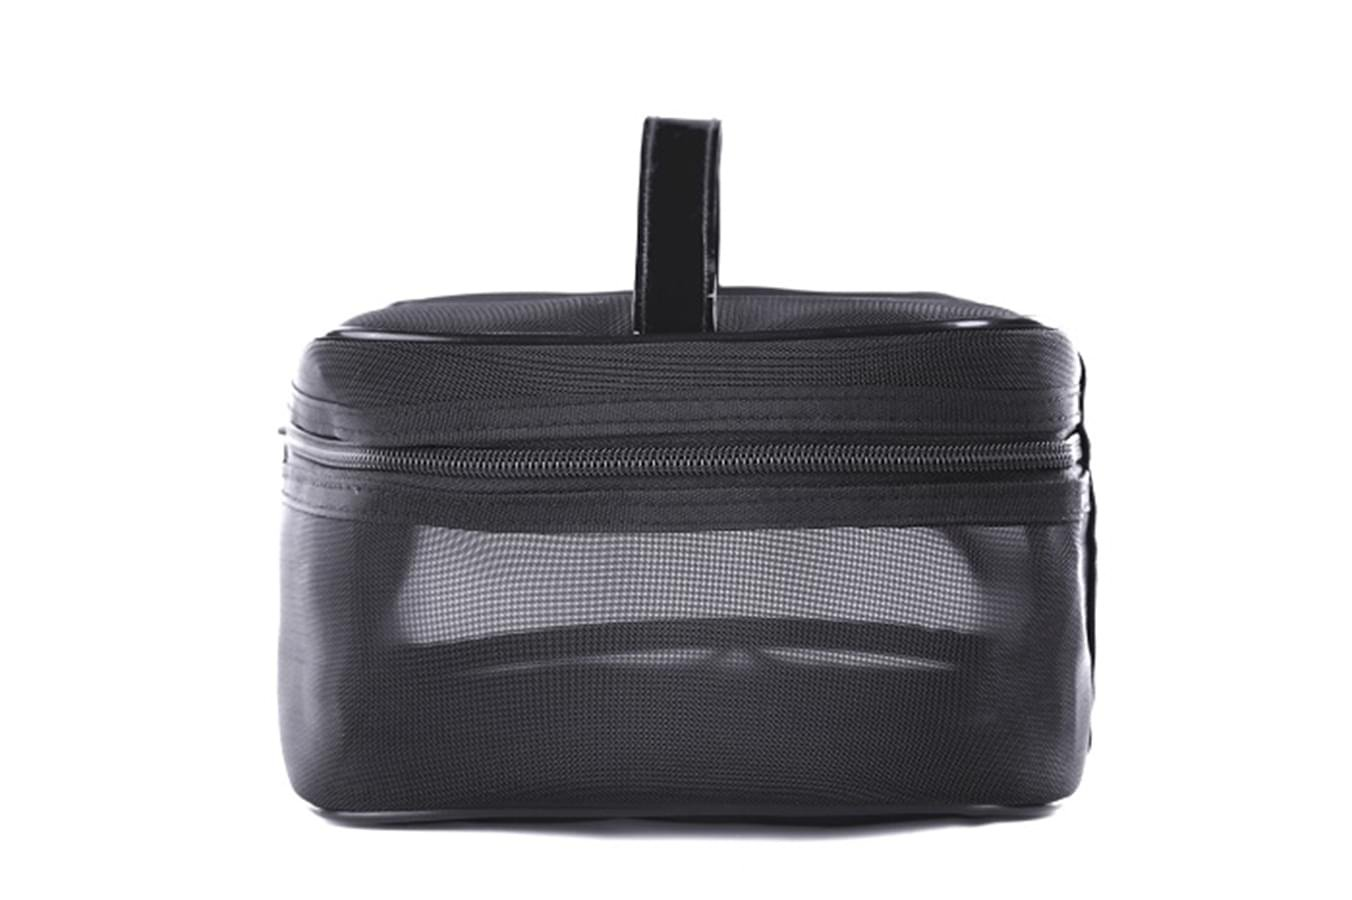 7ff8483a505e Makeup Bag Travel Accessories Makeup Cosmetics Organizer Mesh Bags